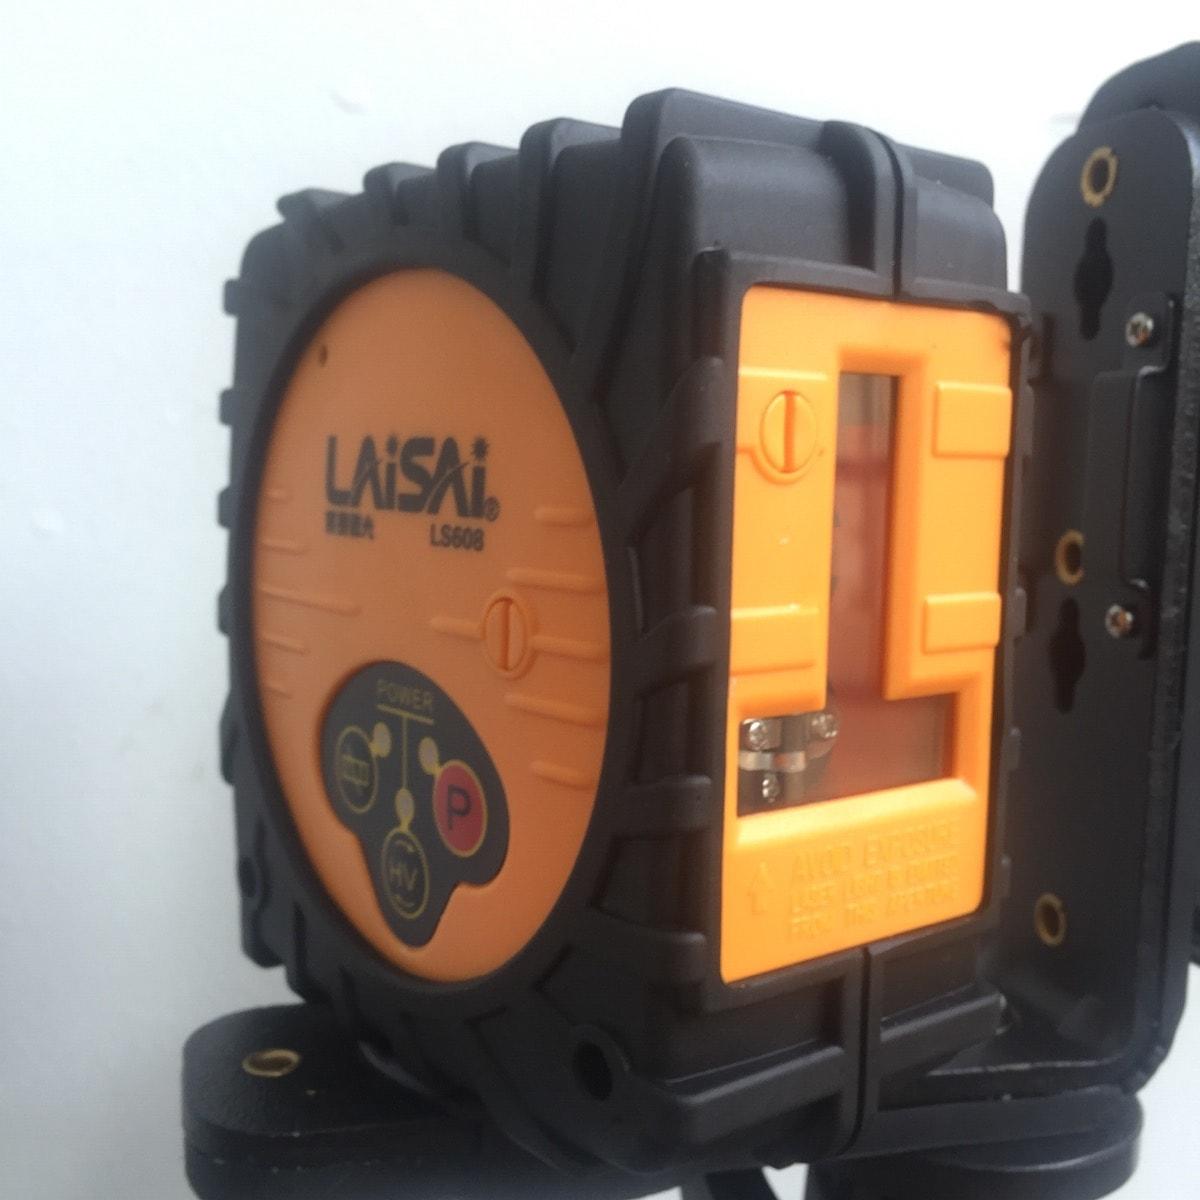 Máy Cân Bằng Laser LAISAI LS 608